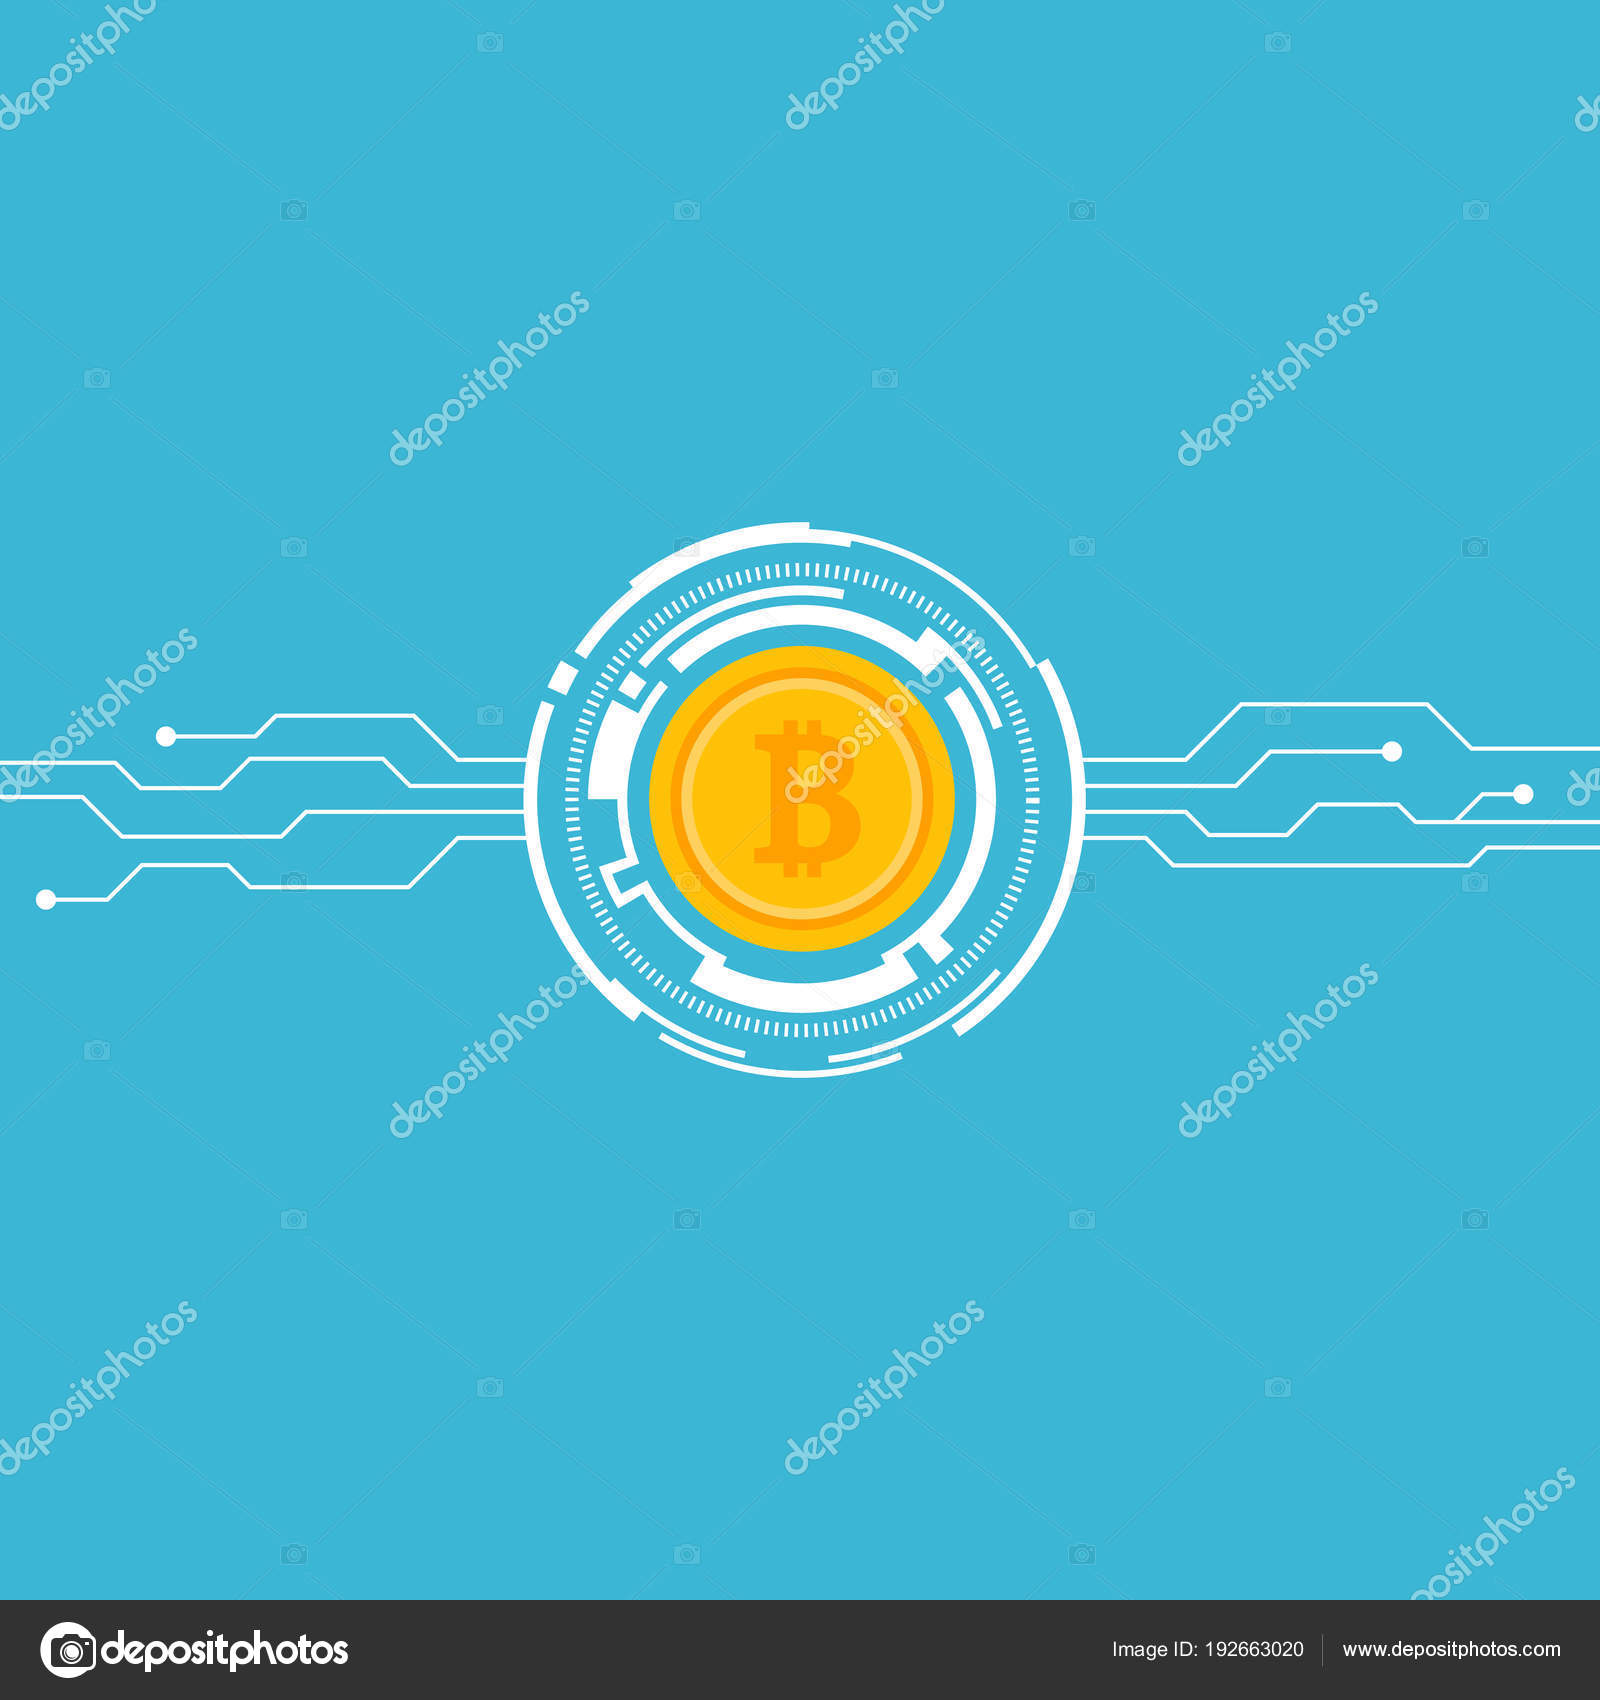 digital marketing cryptocurrency